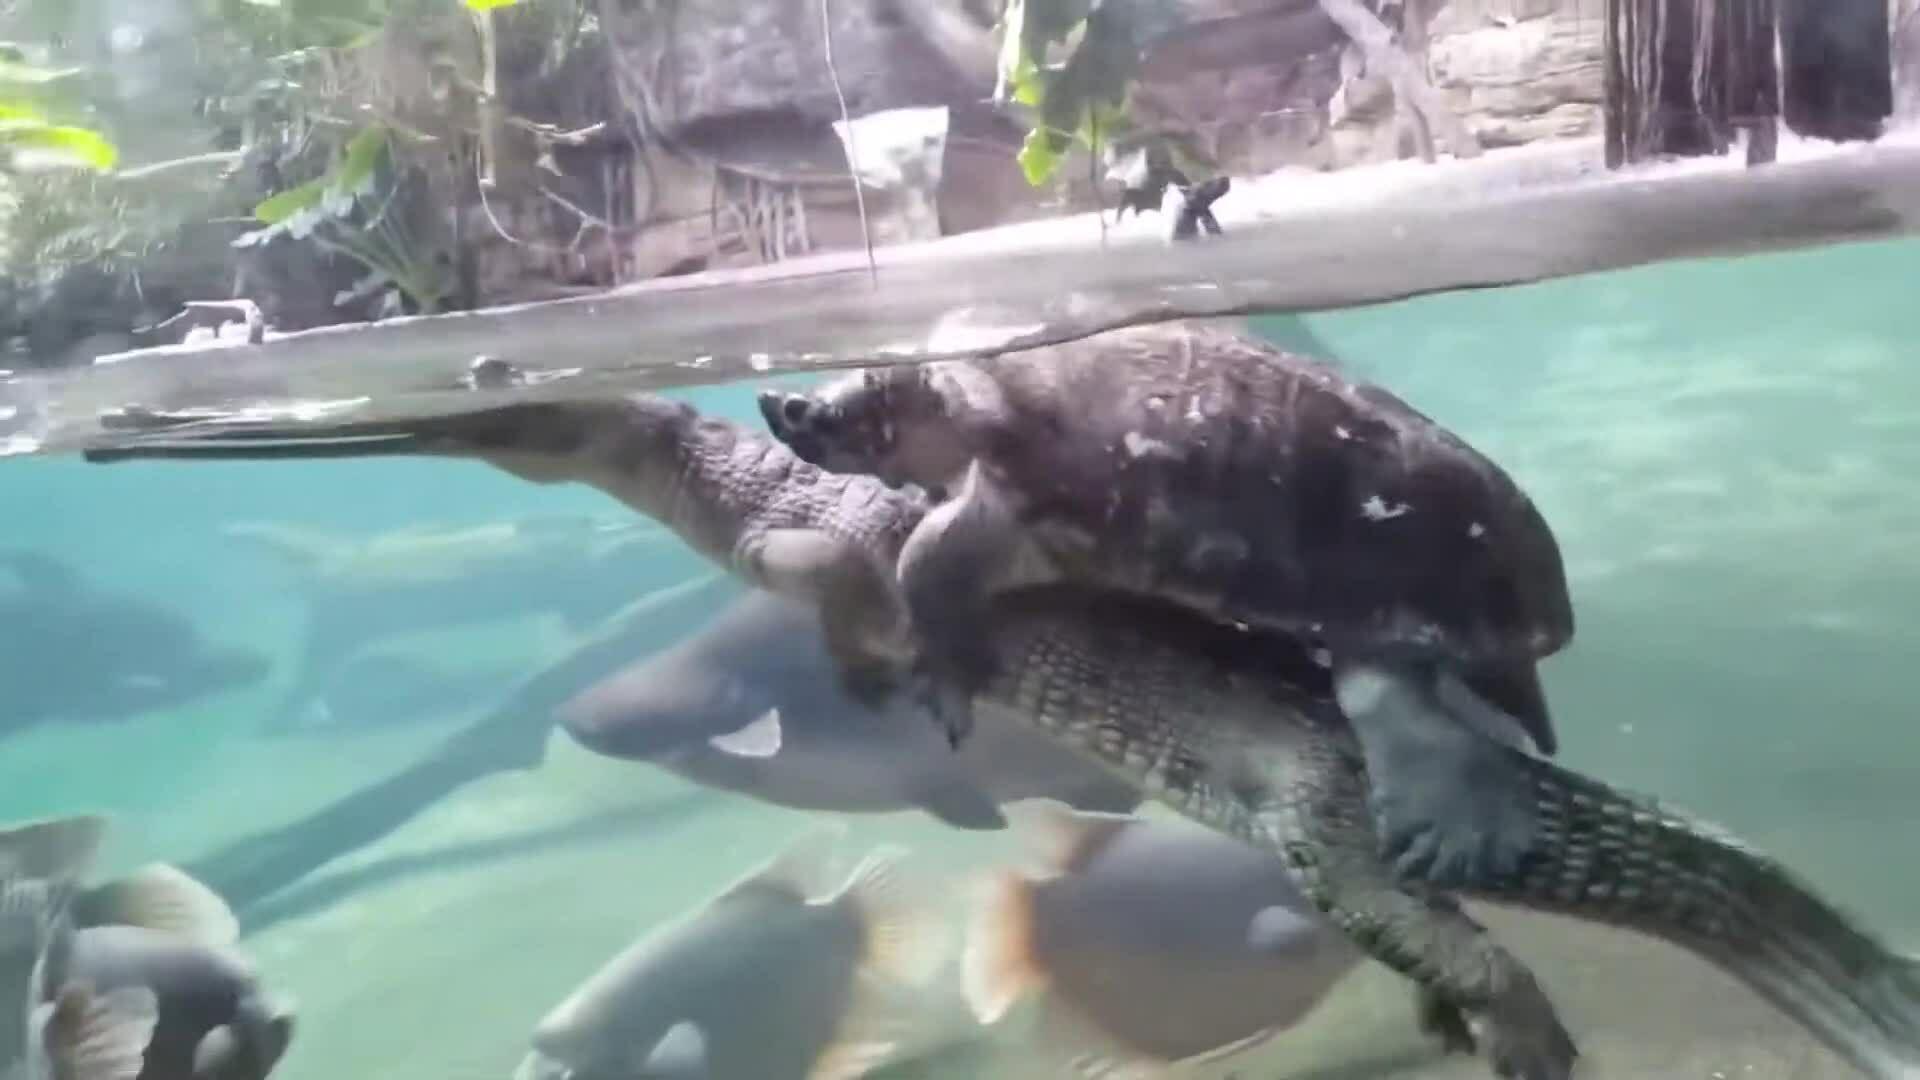 Rùa cưỡi cá sấu dạo trong hồ